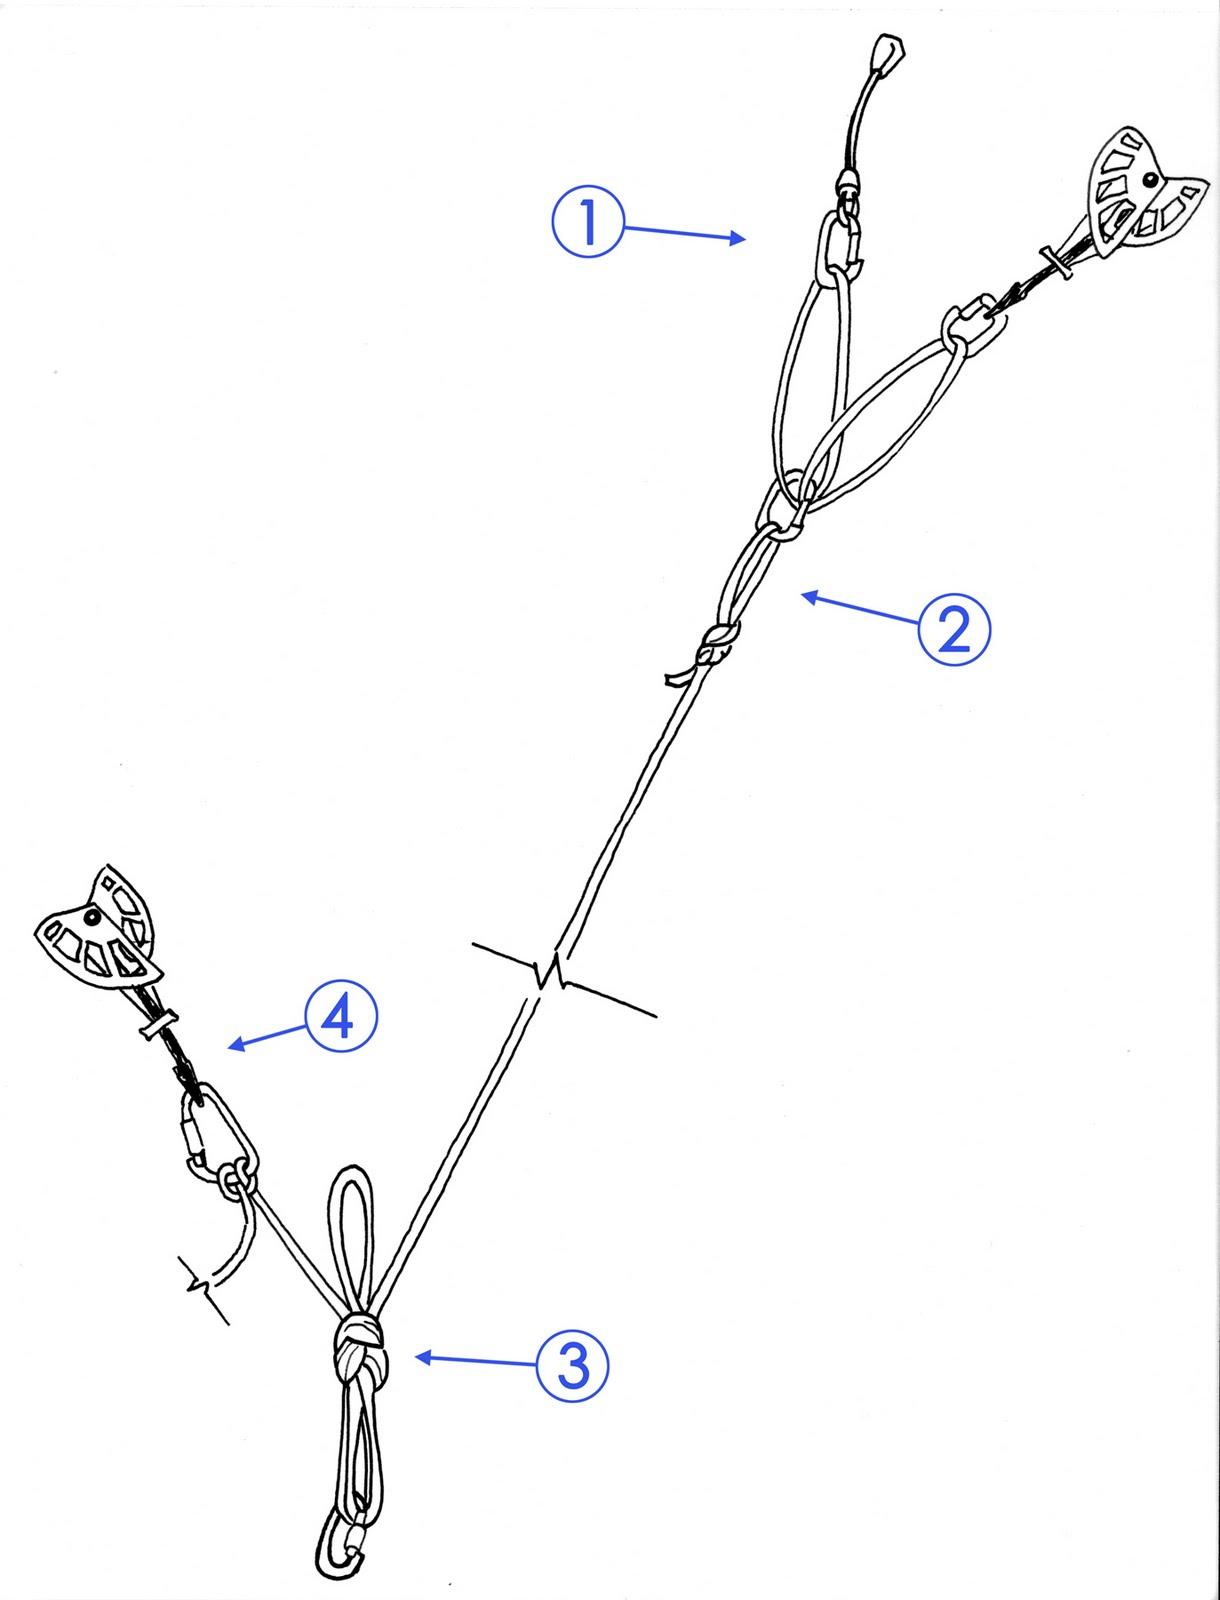 Best Webbing For Building Rappel Anchors